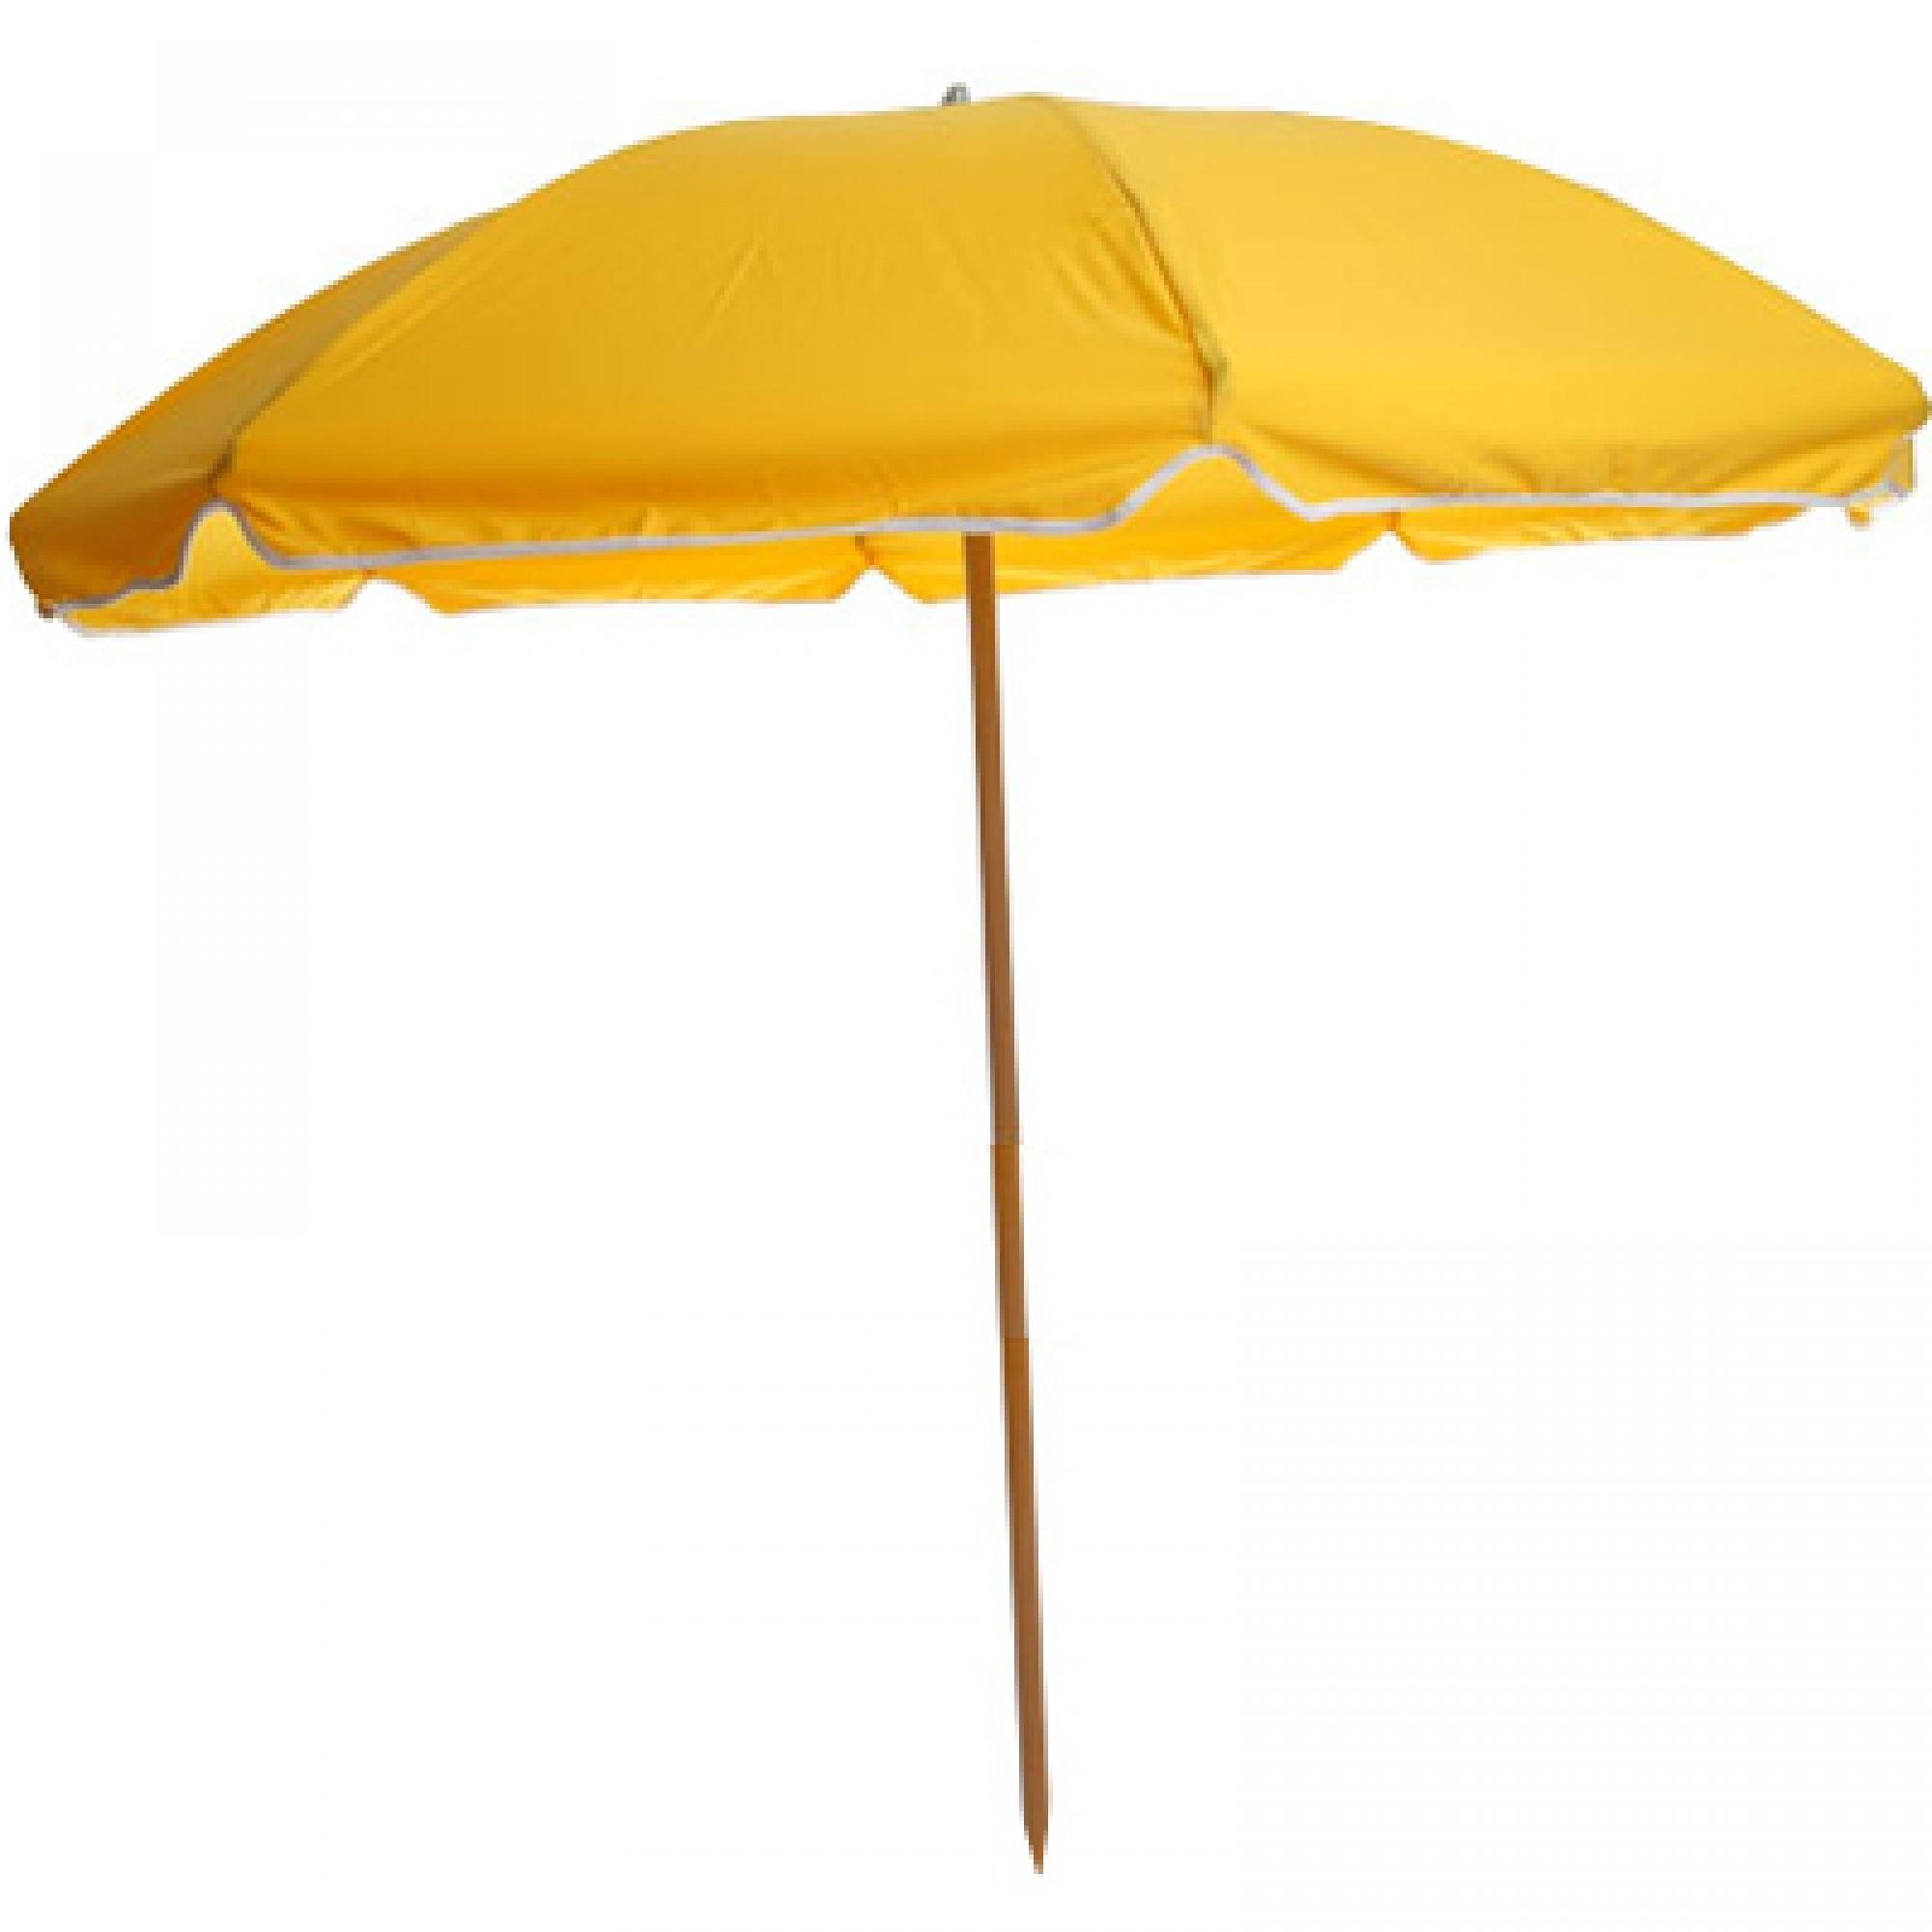 Outdoor Patio Decorative Umbrella